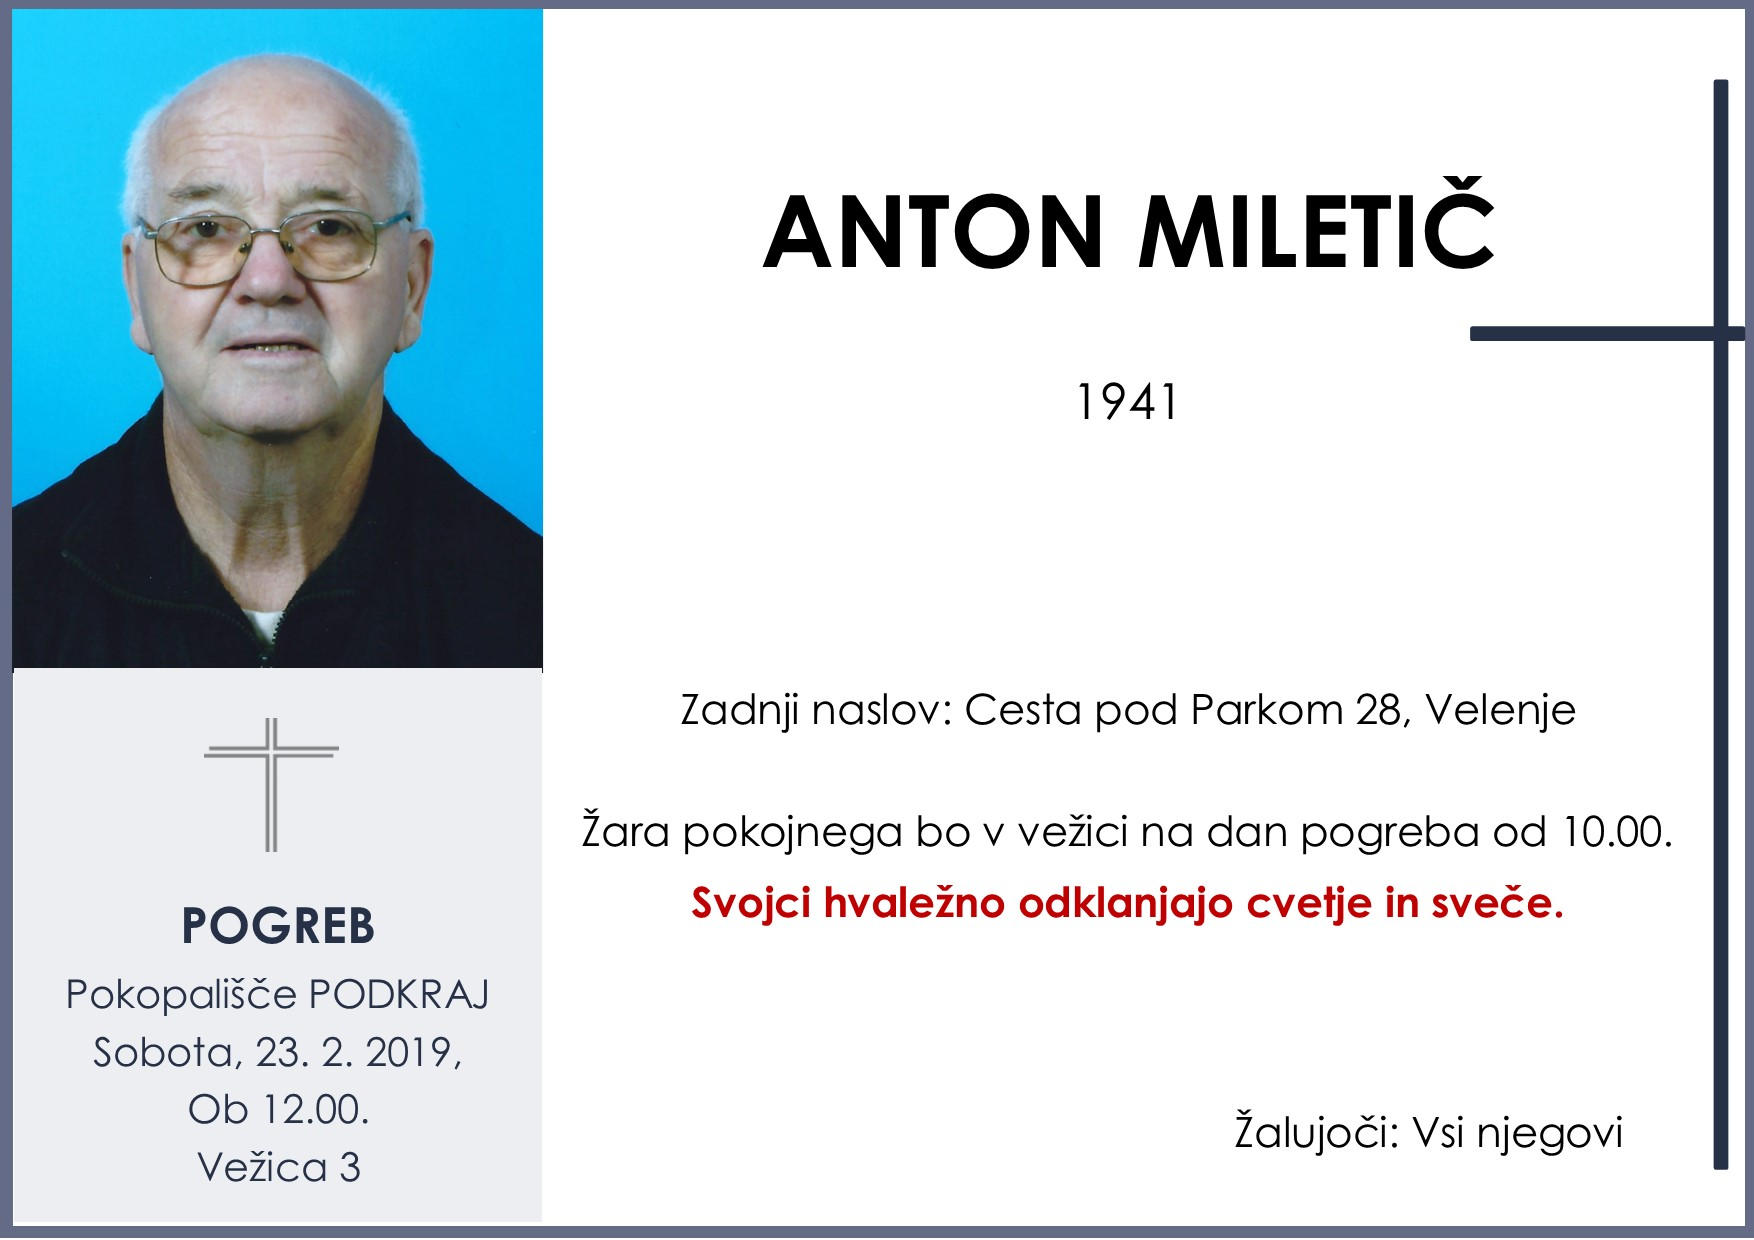 ANTON MILETIČ, Podkraj, 23. 02. 2019